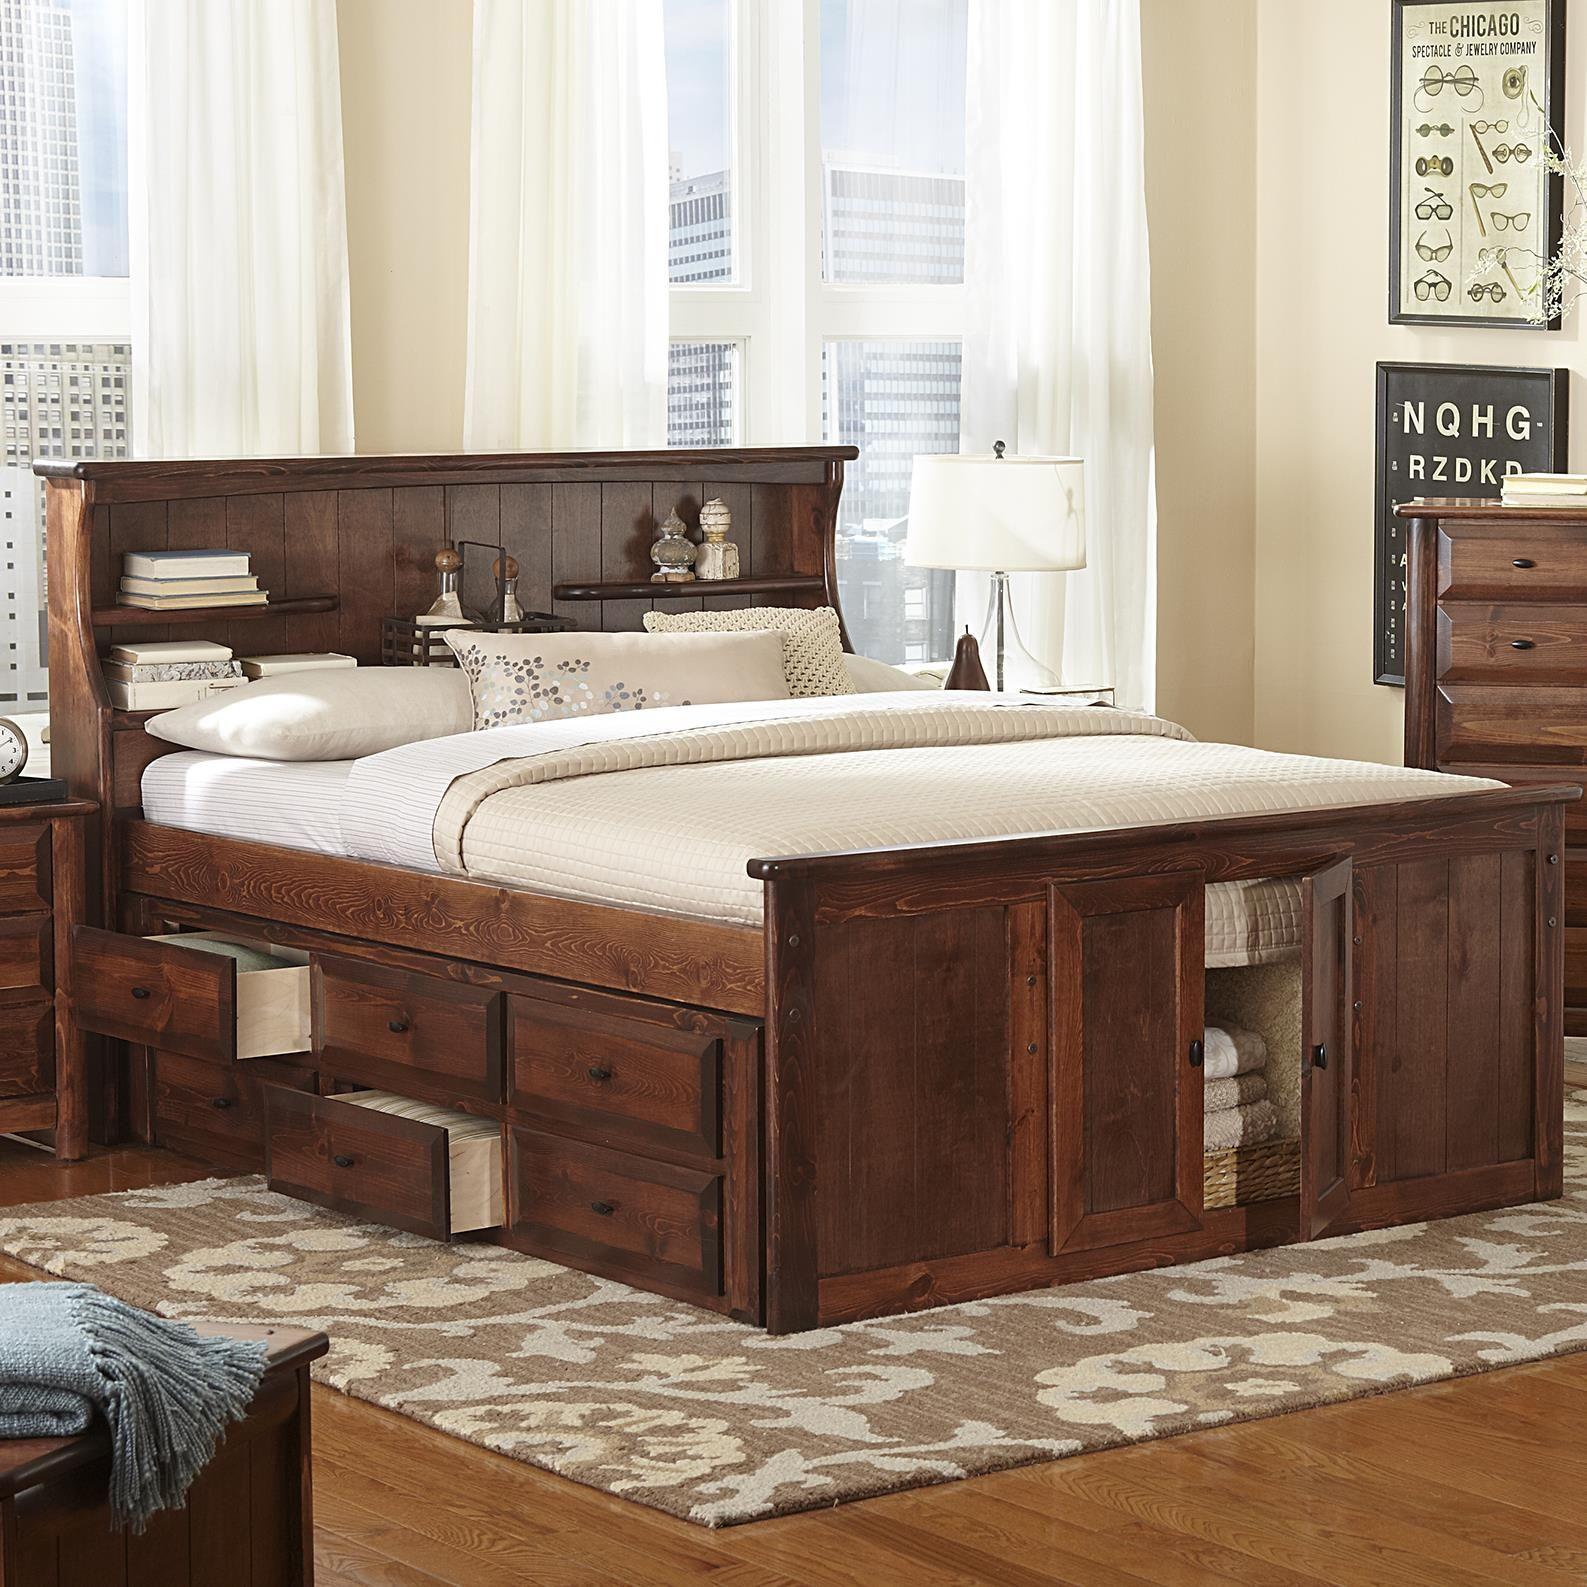 Laguna Queen Book Case Bed w/ Footboard Storage by